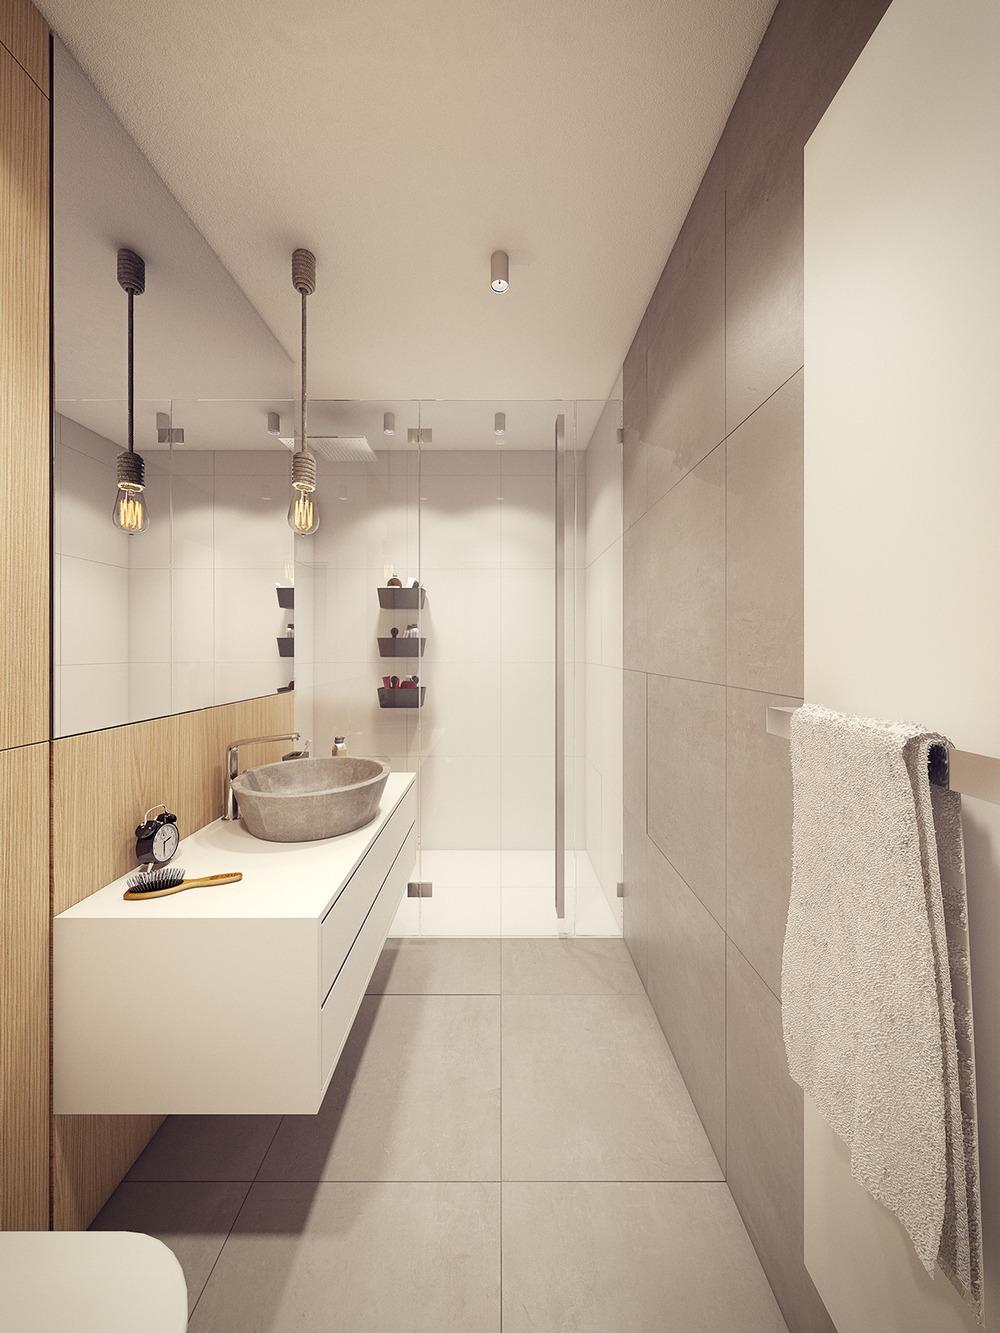 stone-basin-sink.jpg